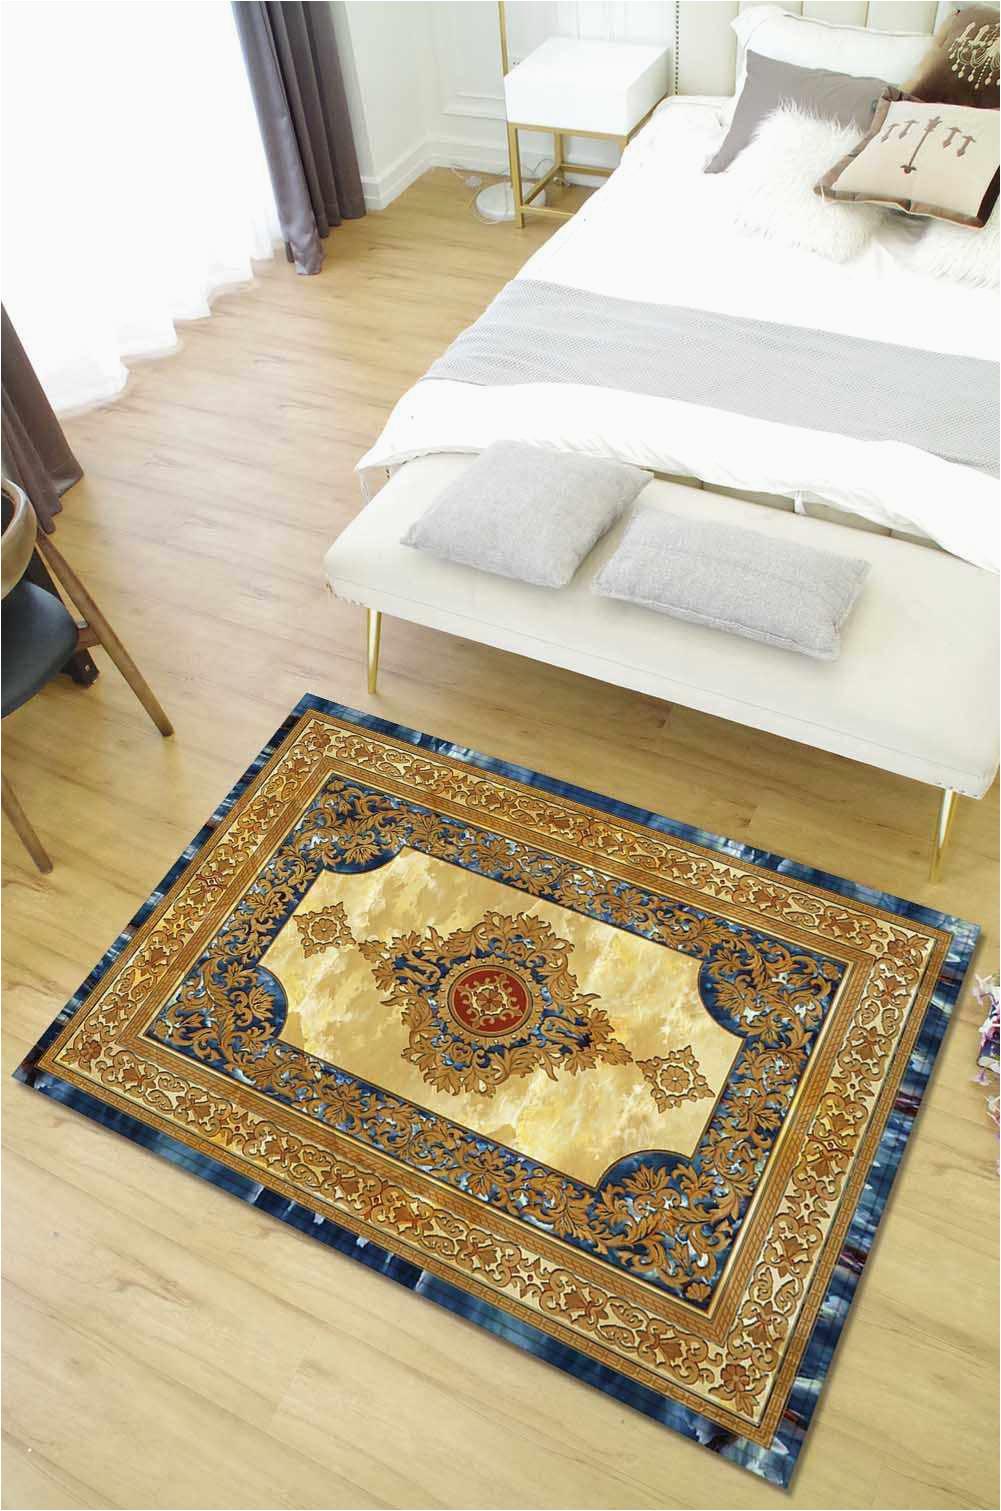 Zeegle European Living Room Carpet Anti slip Floor Mats Bedroom Bed Blanket Carpet Sofa Table Area q50